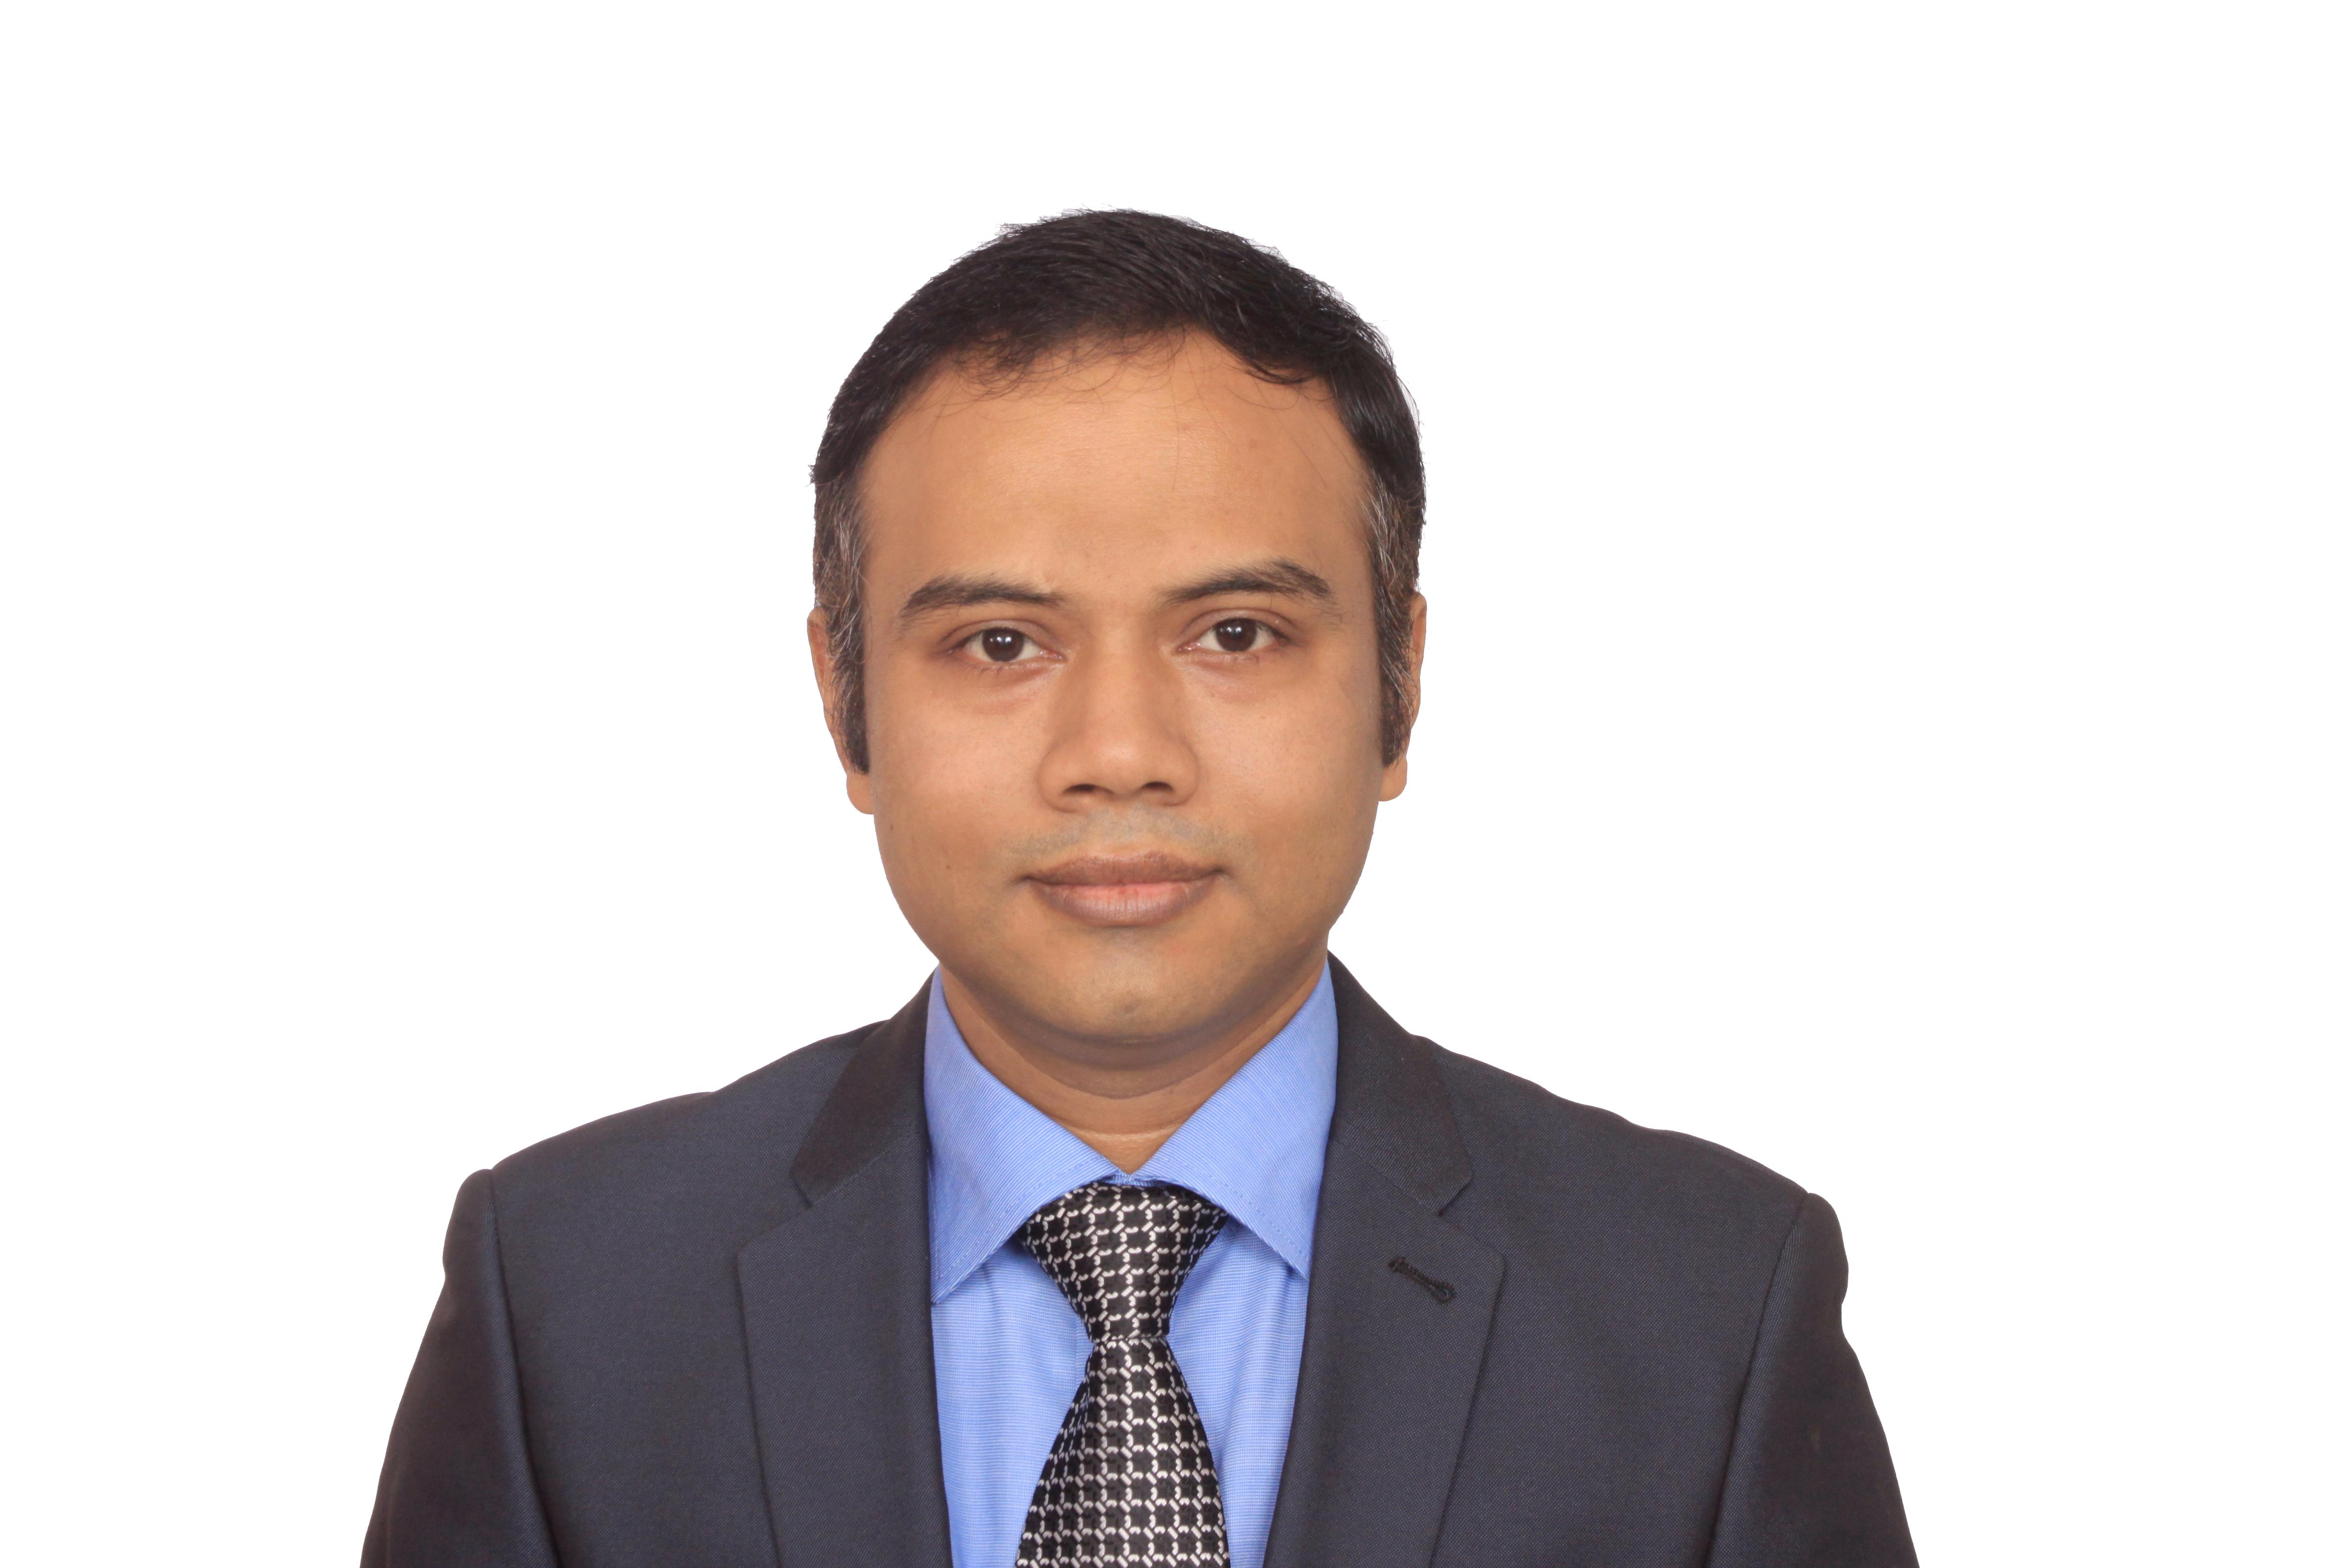 Muhammad Nazrul Islam